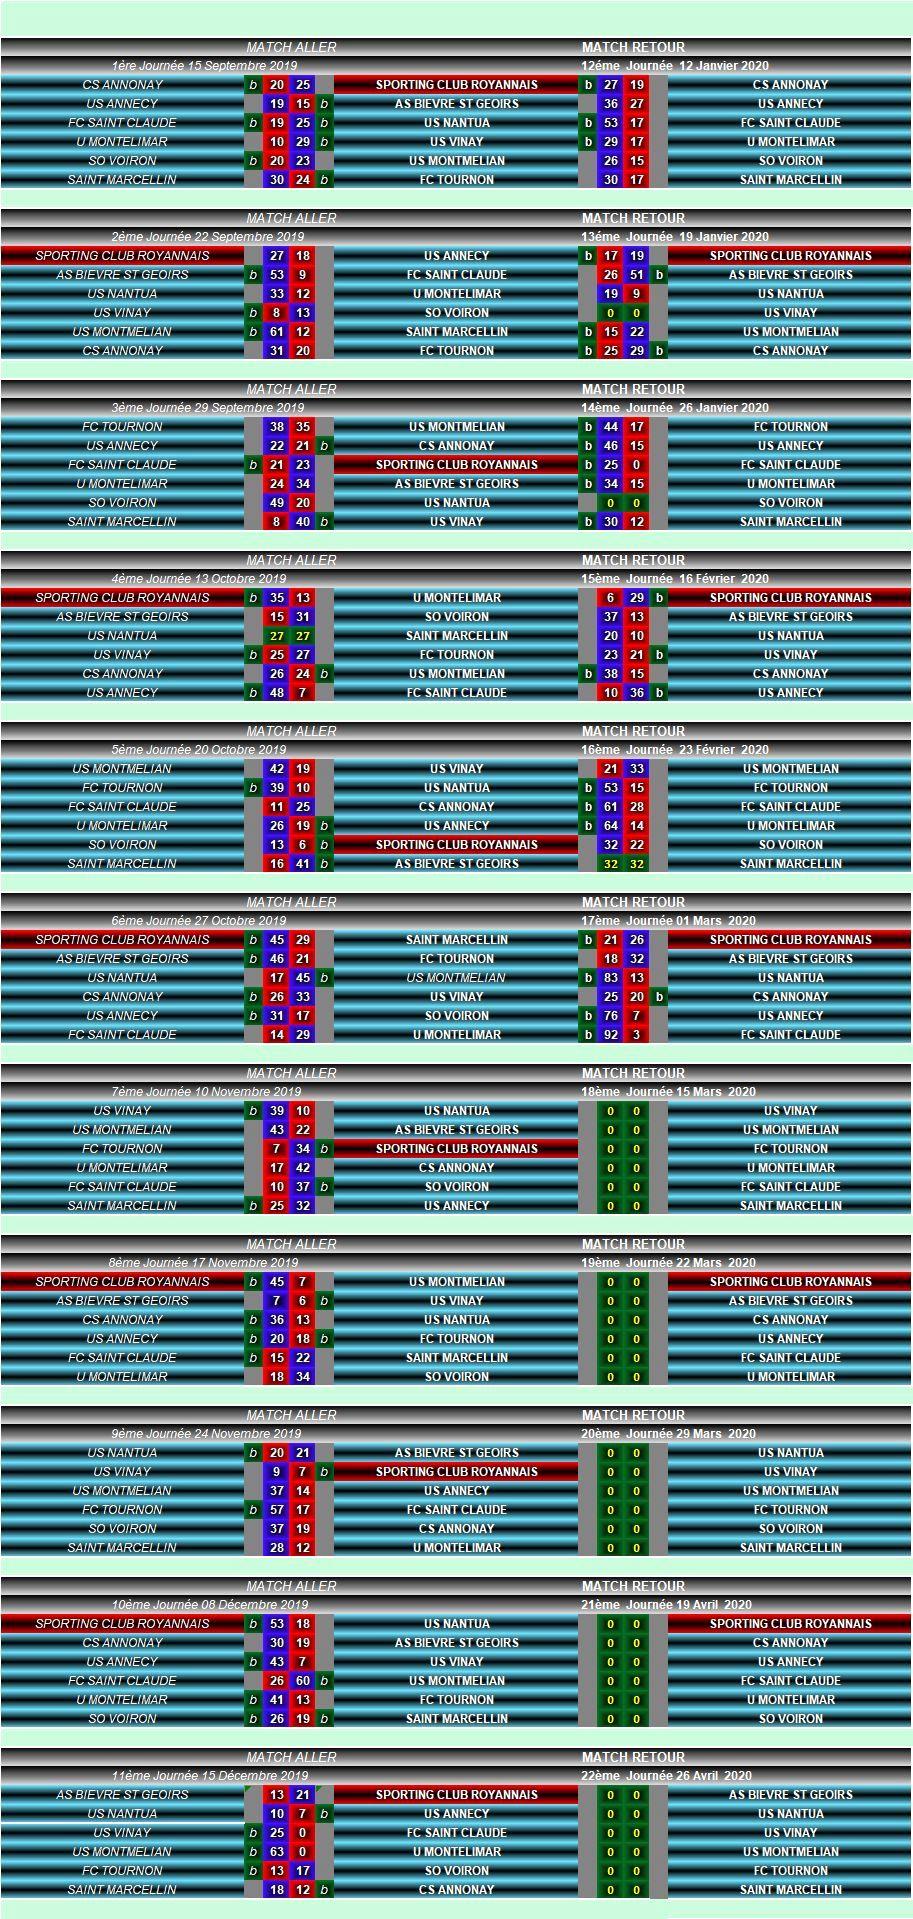 Calendrier Séniors 2